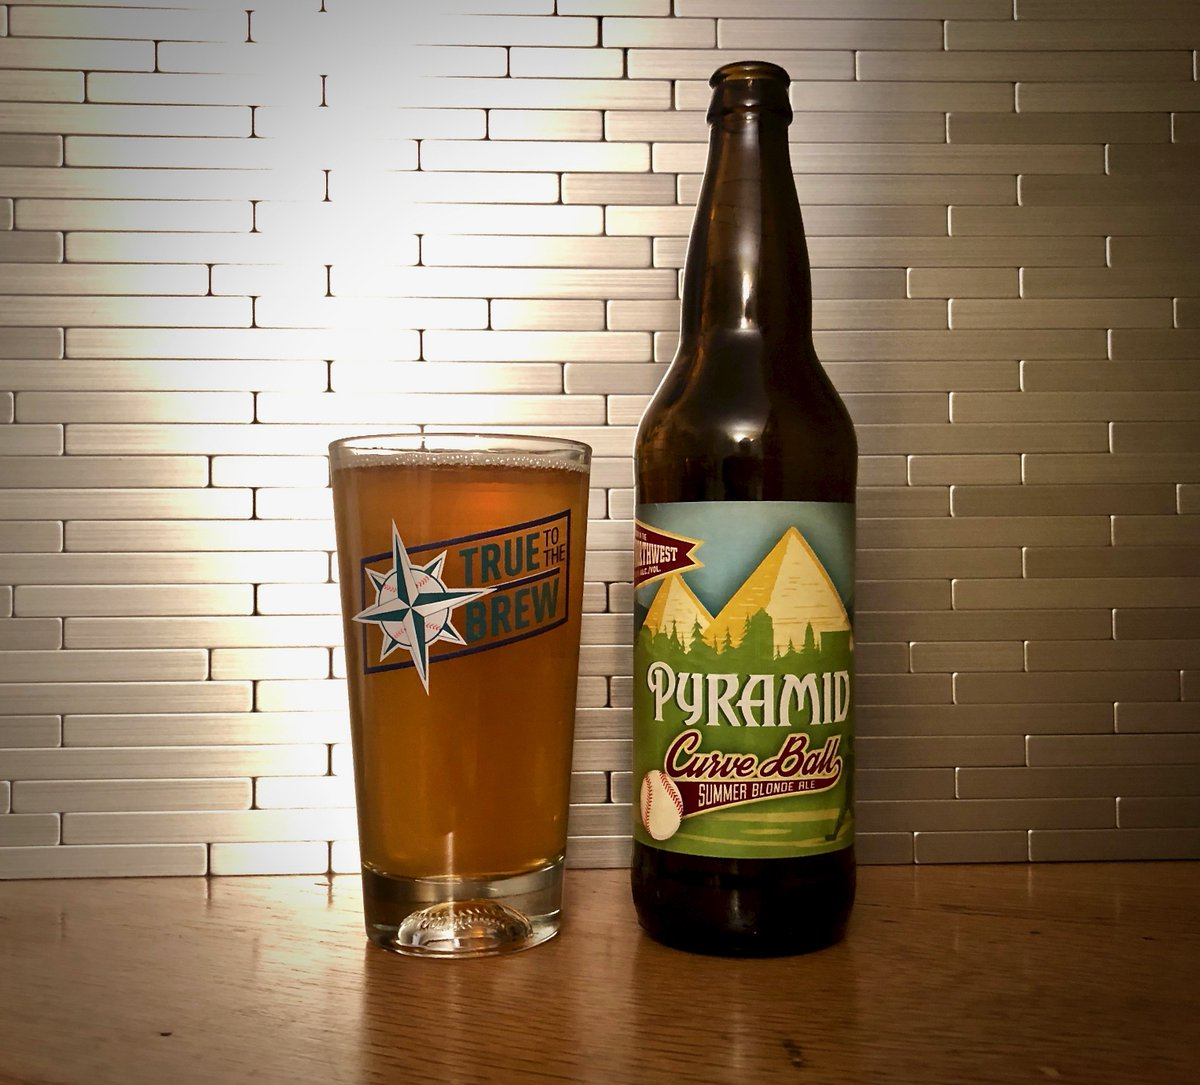 Pyramid Brewing Co